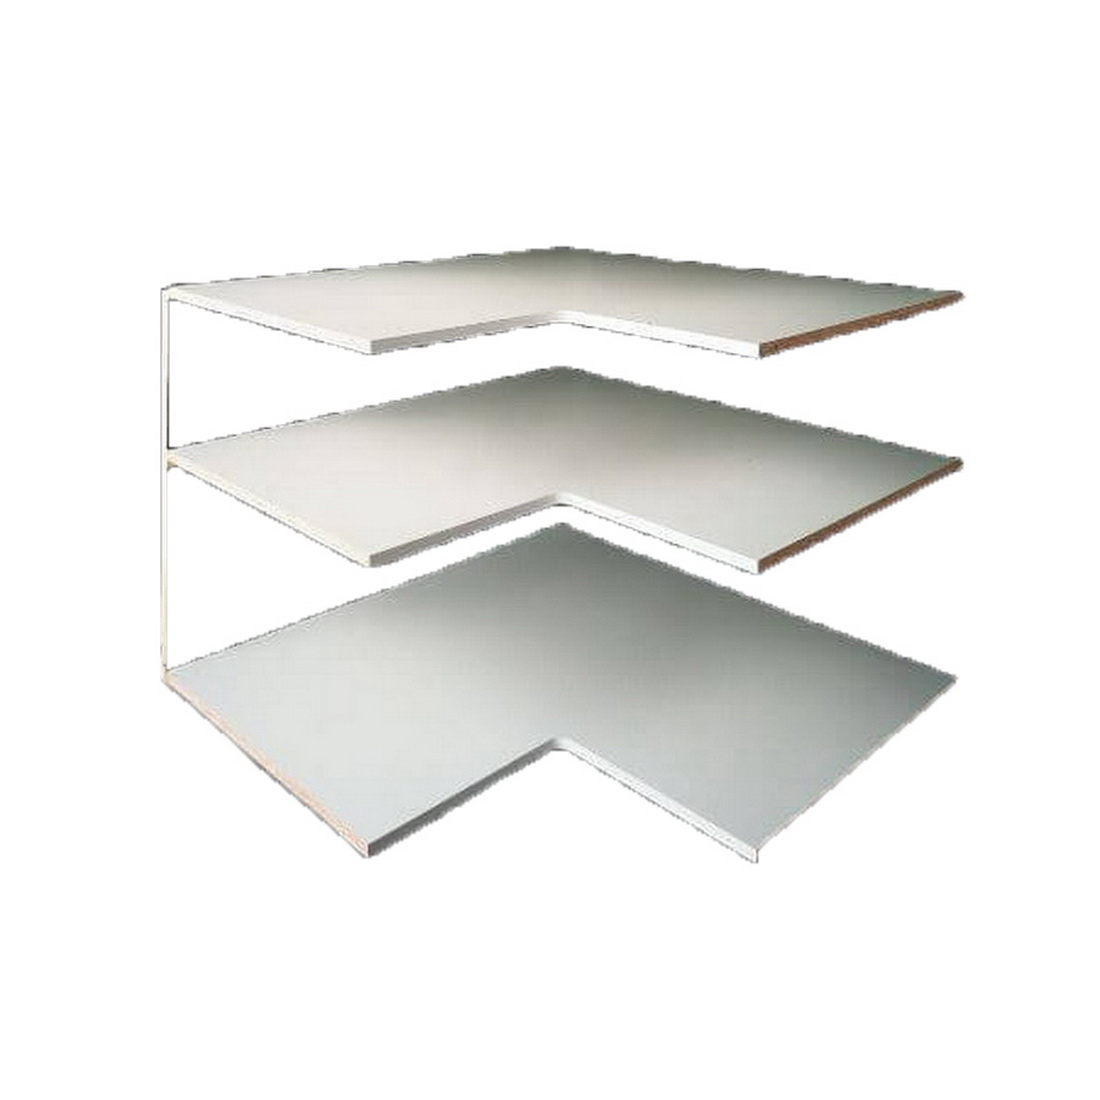 Laminex Whiteboard MDF Panel 2440 x 1220 x 16 mm Satin 872415